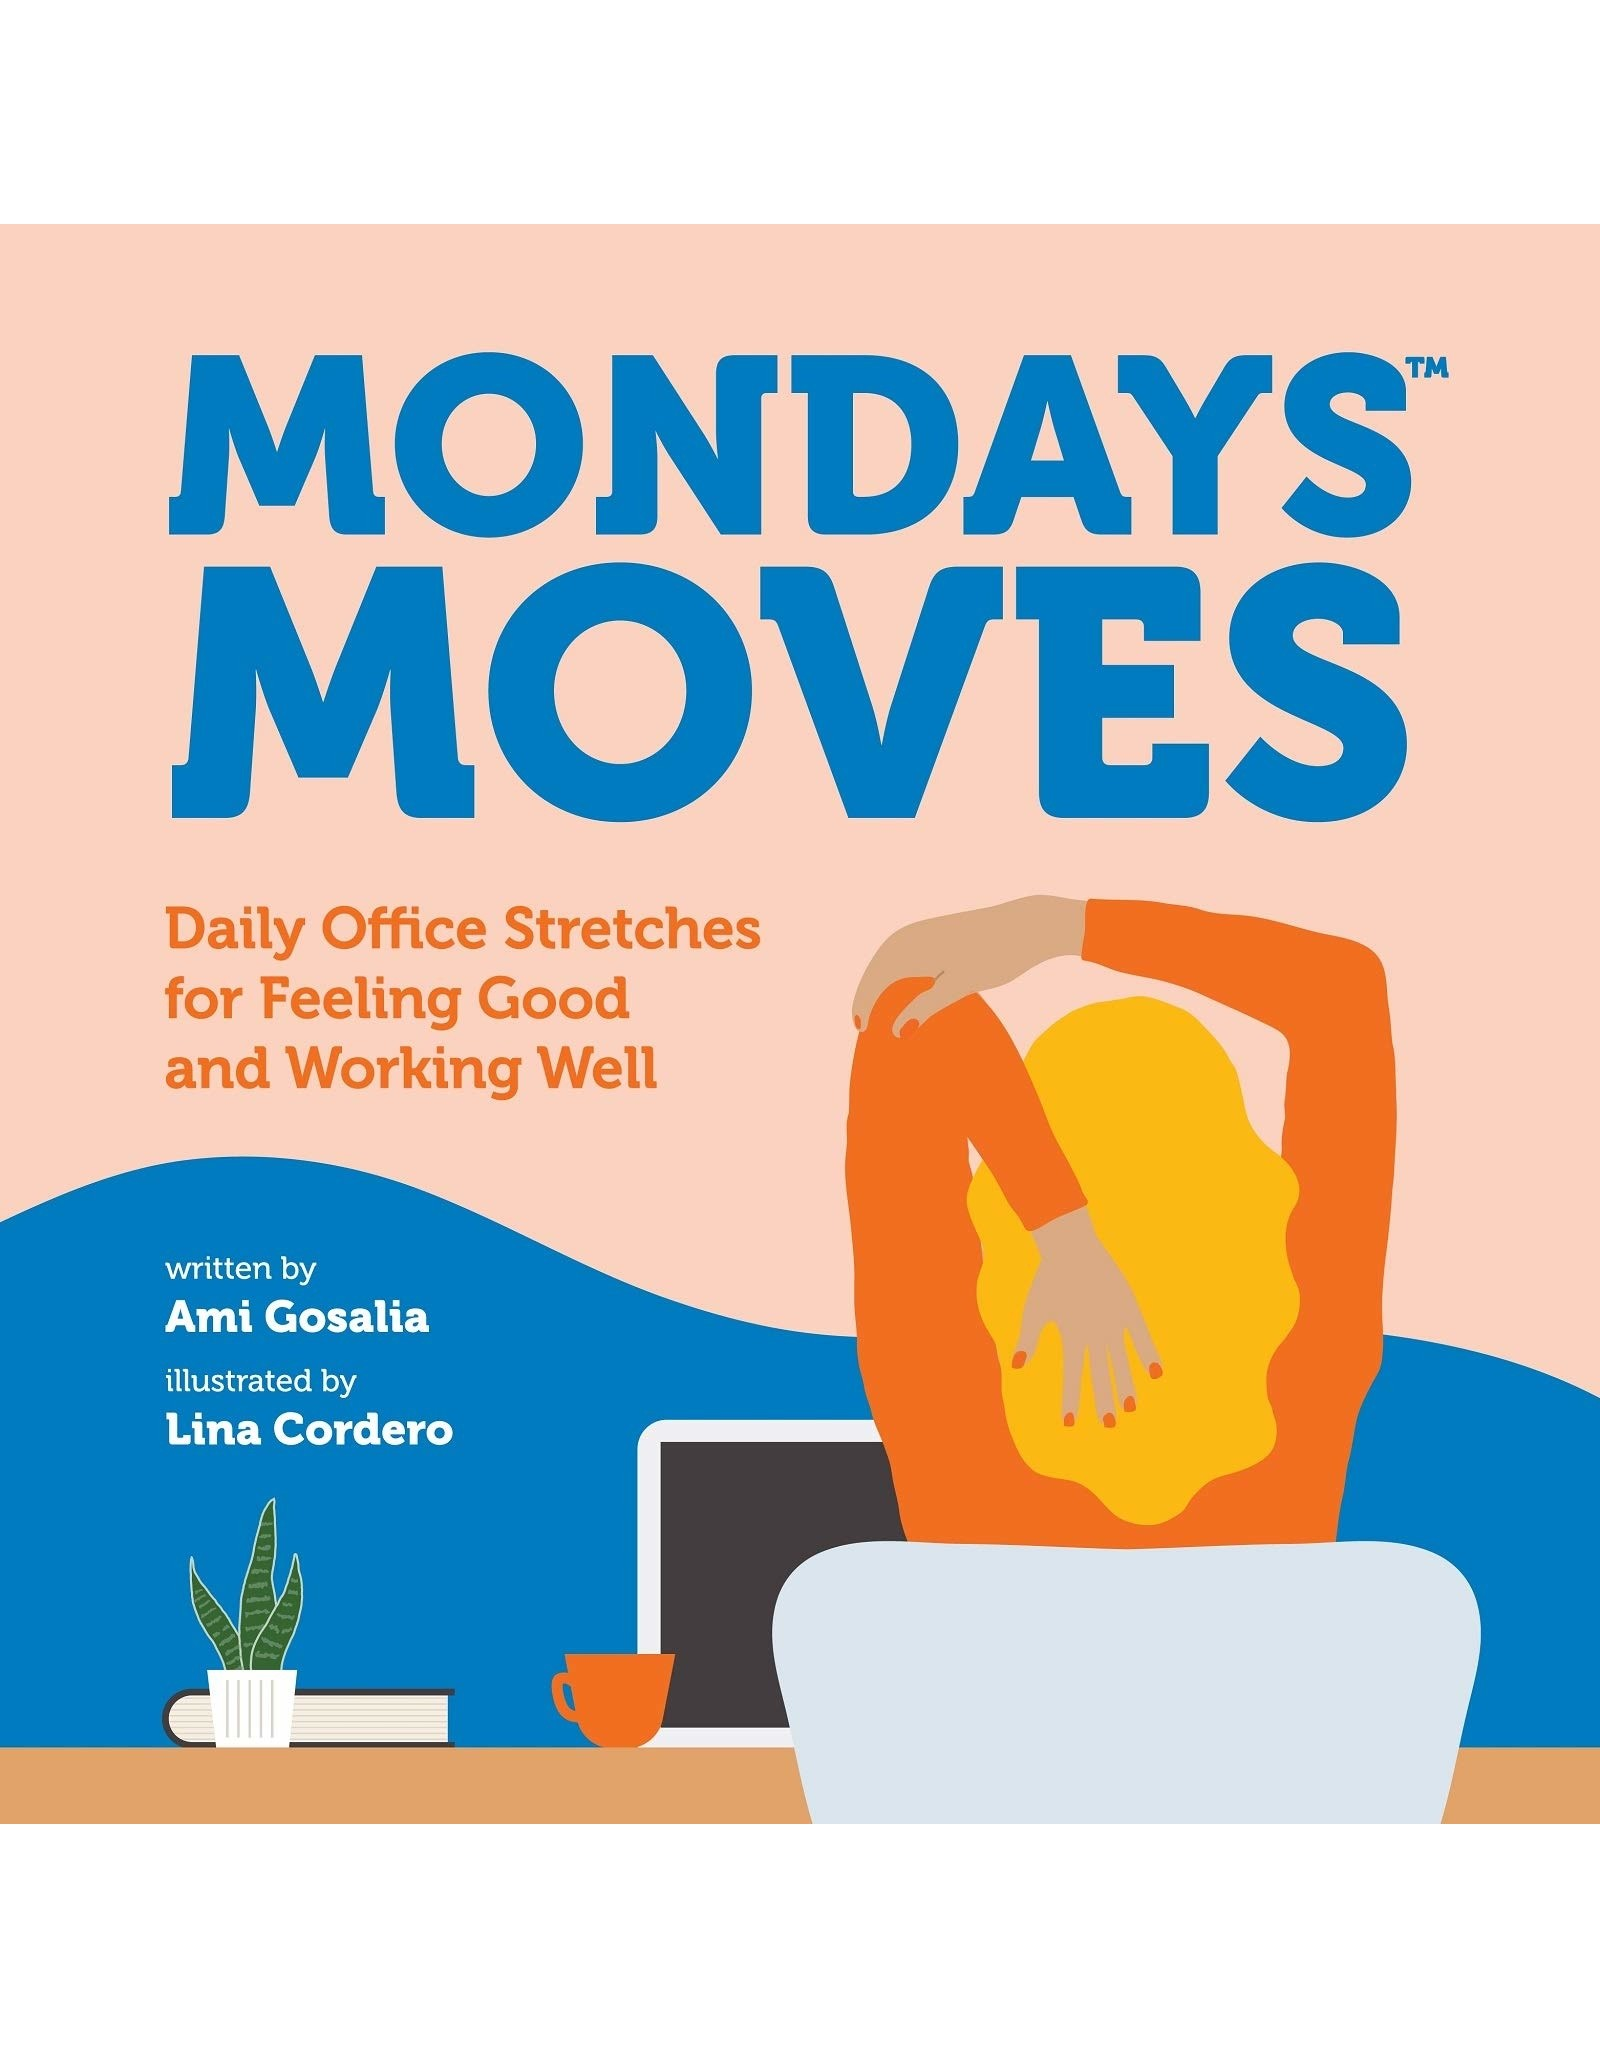 Books Monday Moves Written by Ami Gosalia (sourceathome)